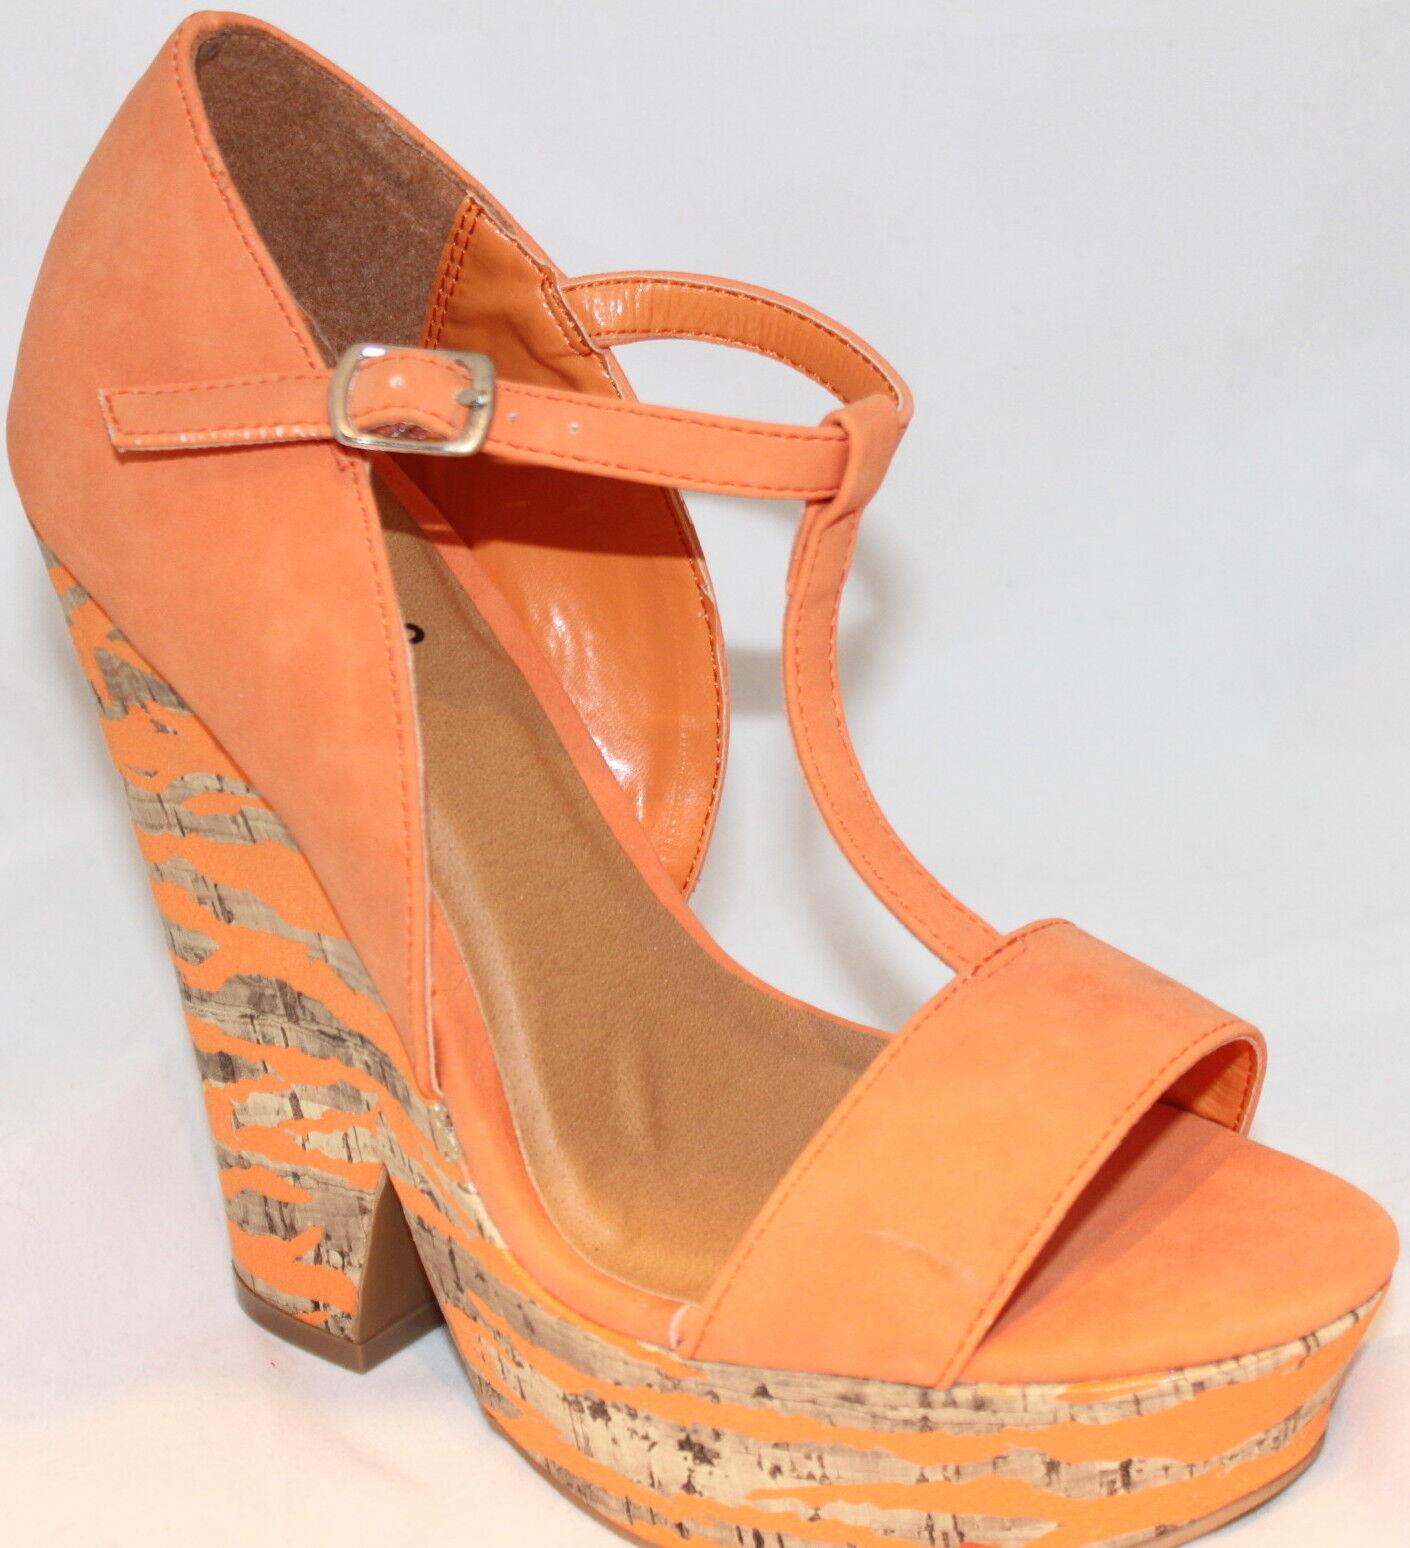 Qupid Chunky Orange Heels Platform Wedge Sandals Orange Chunky T-strap Open Toes Women's Shoes 8ec400